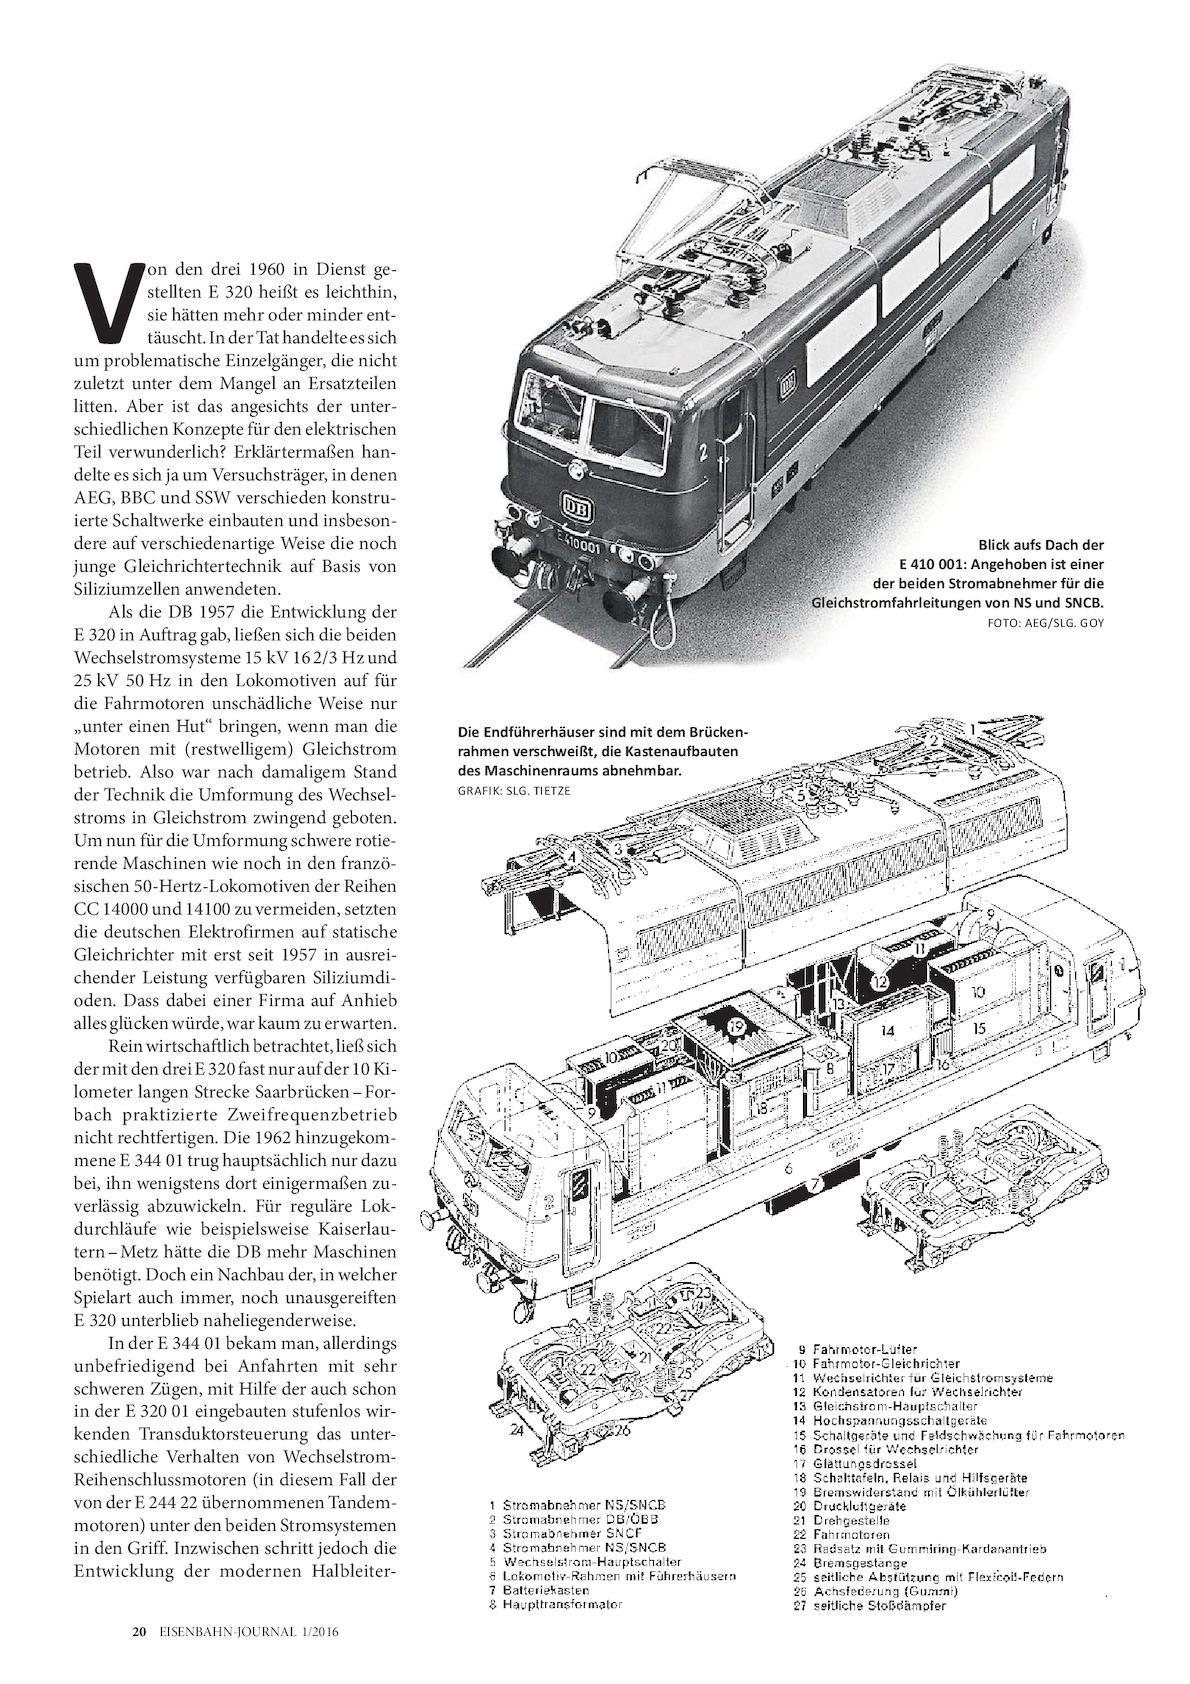 Wunderbar 67 72 Chevy Drehgestellrahmen Fotos - Rahmen Ideen ...